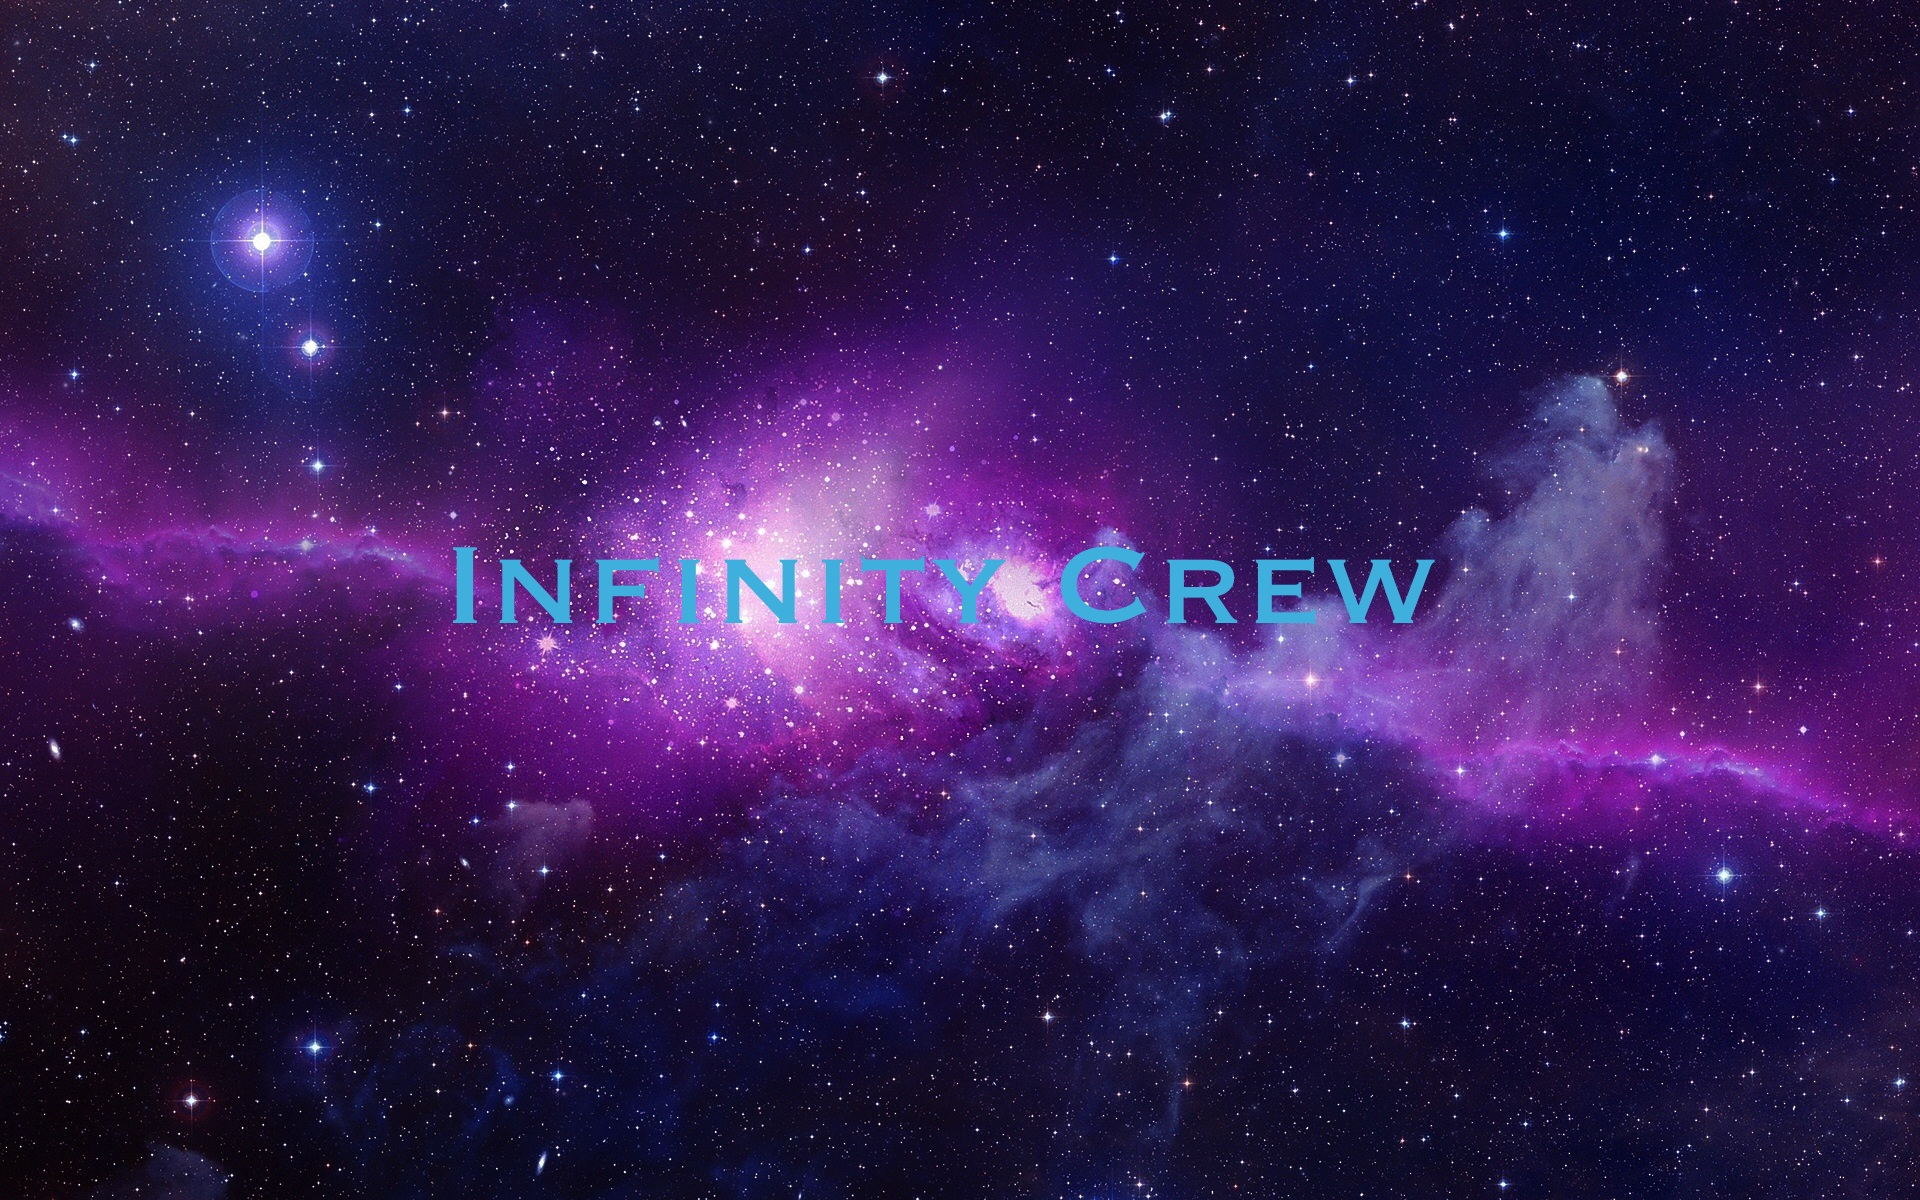 infinity-symbol-background-tumblr